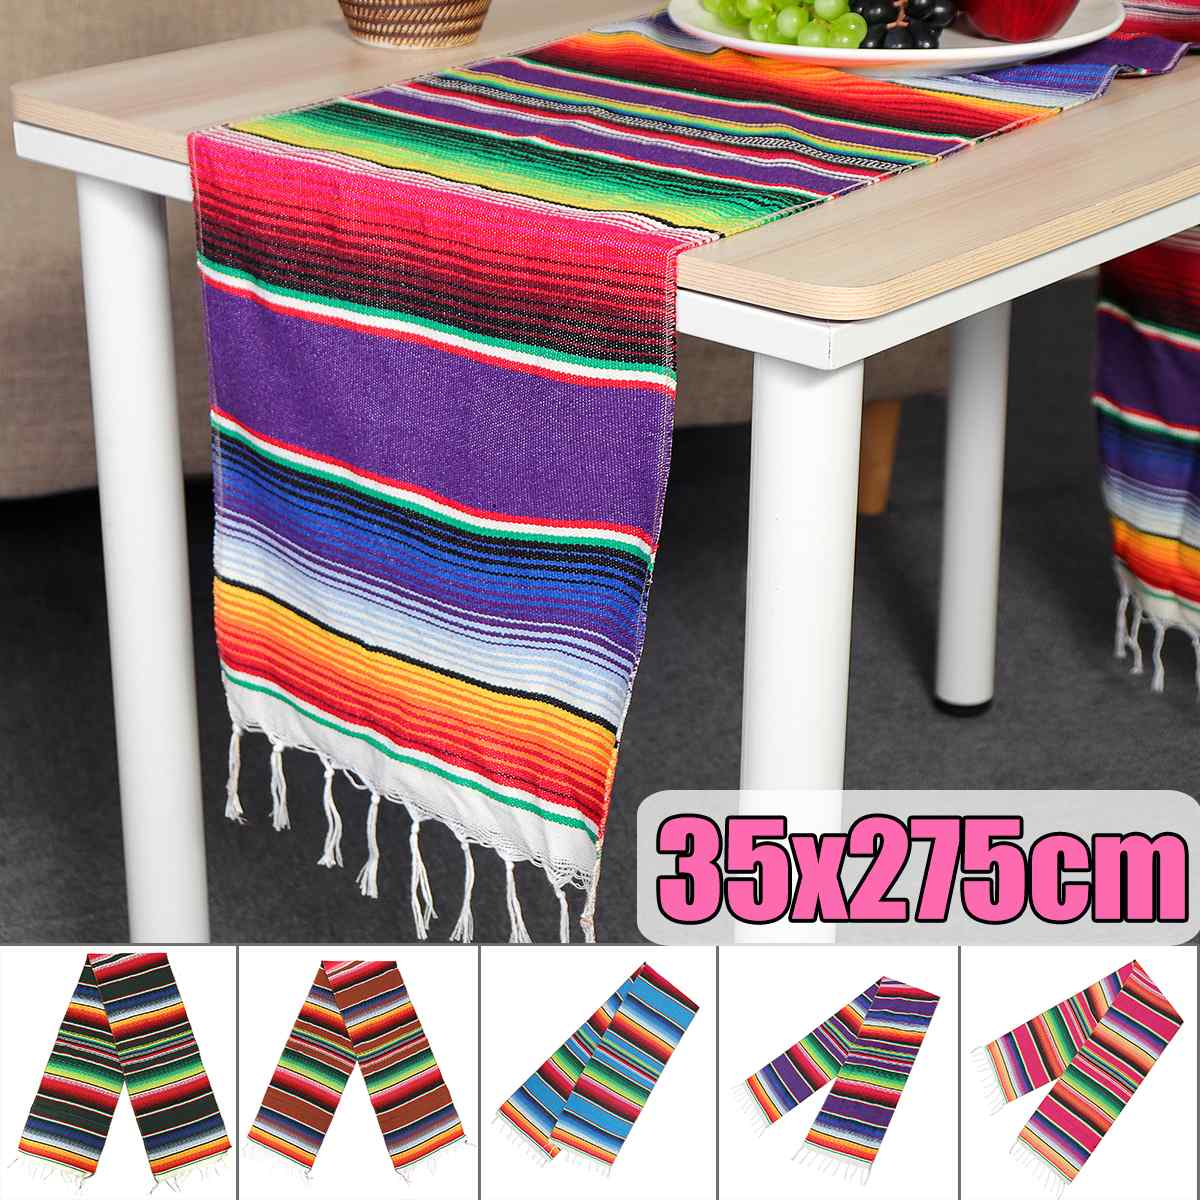 5 Color Mexican Party Serape Cotton Tablecloth Stripe Table Runner Rainbow Wedding Chritmas Table Cloth Flag Home Decor